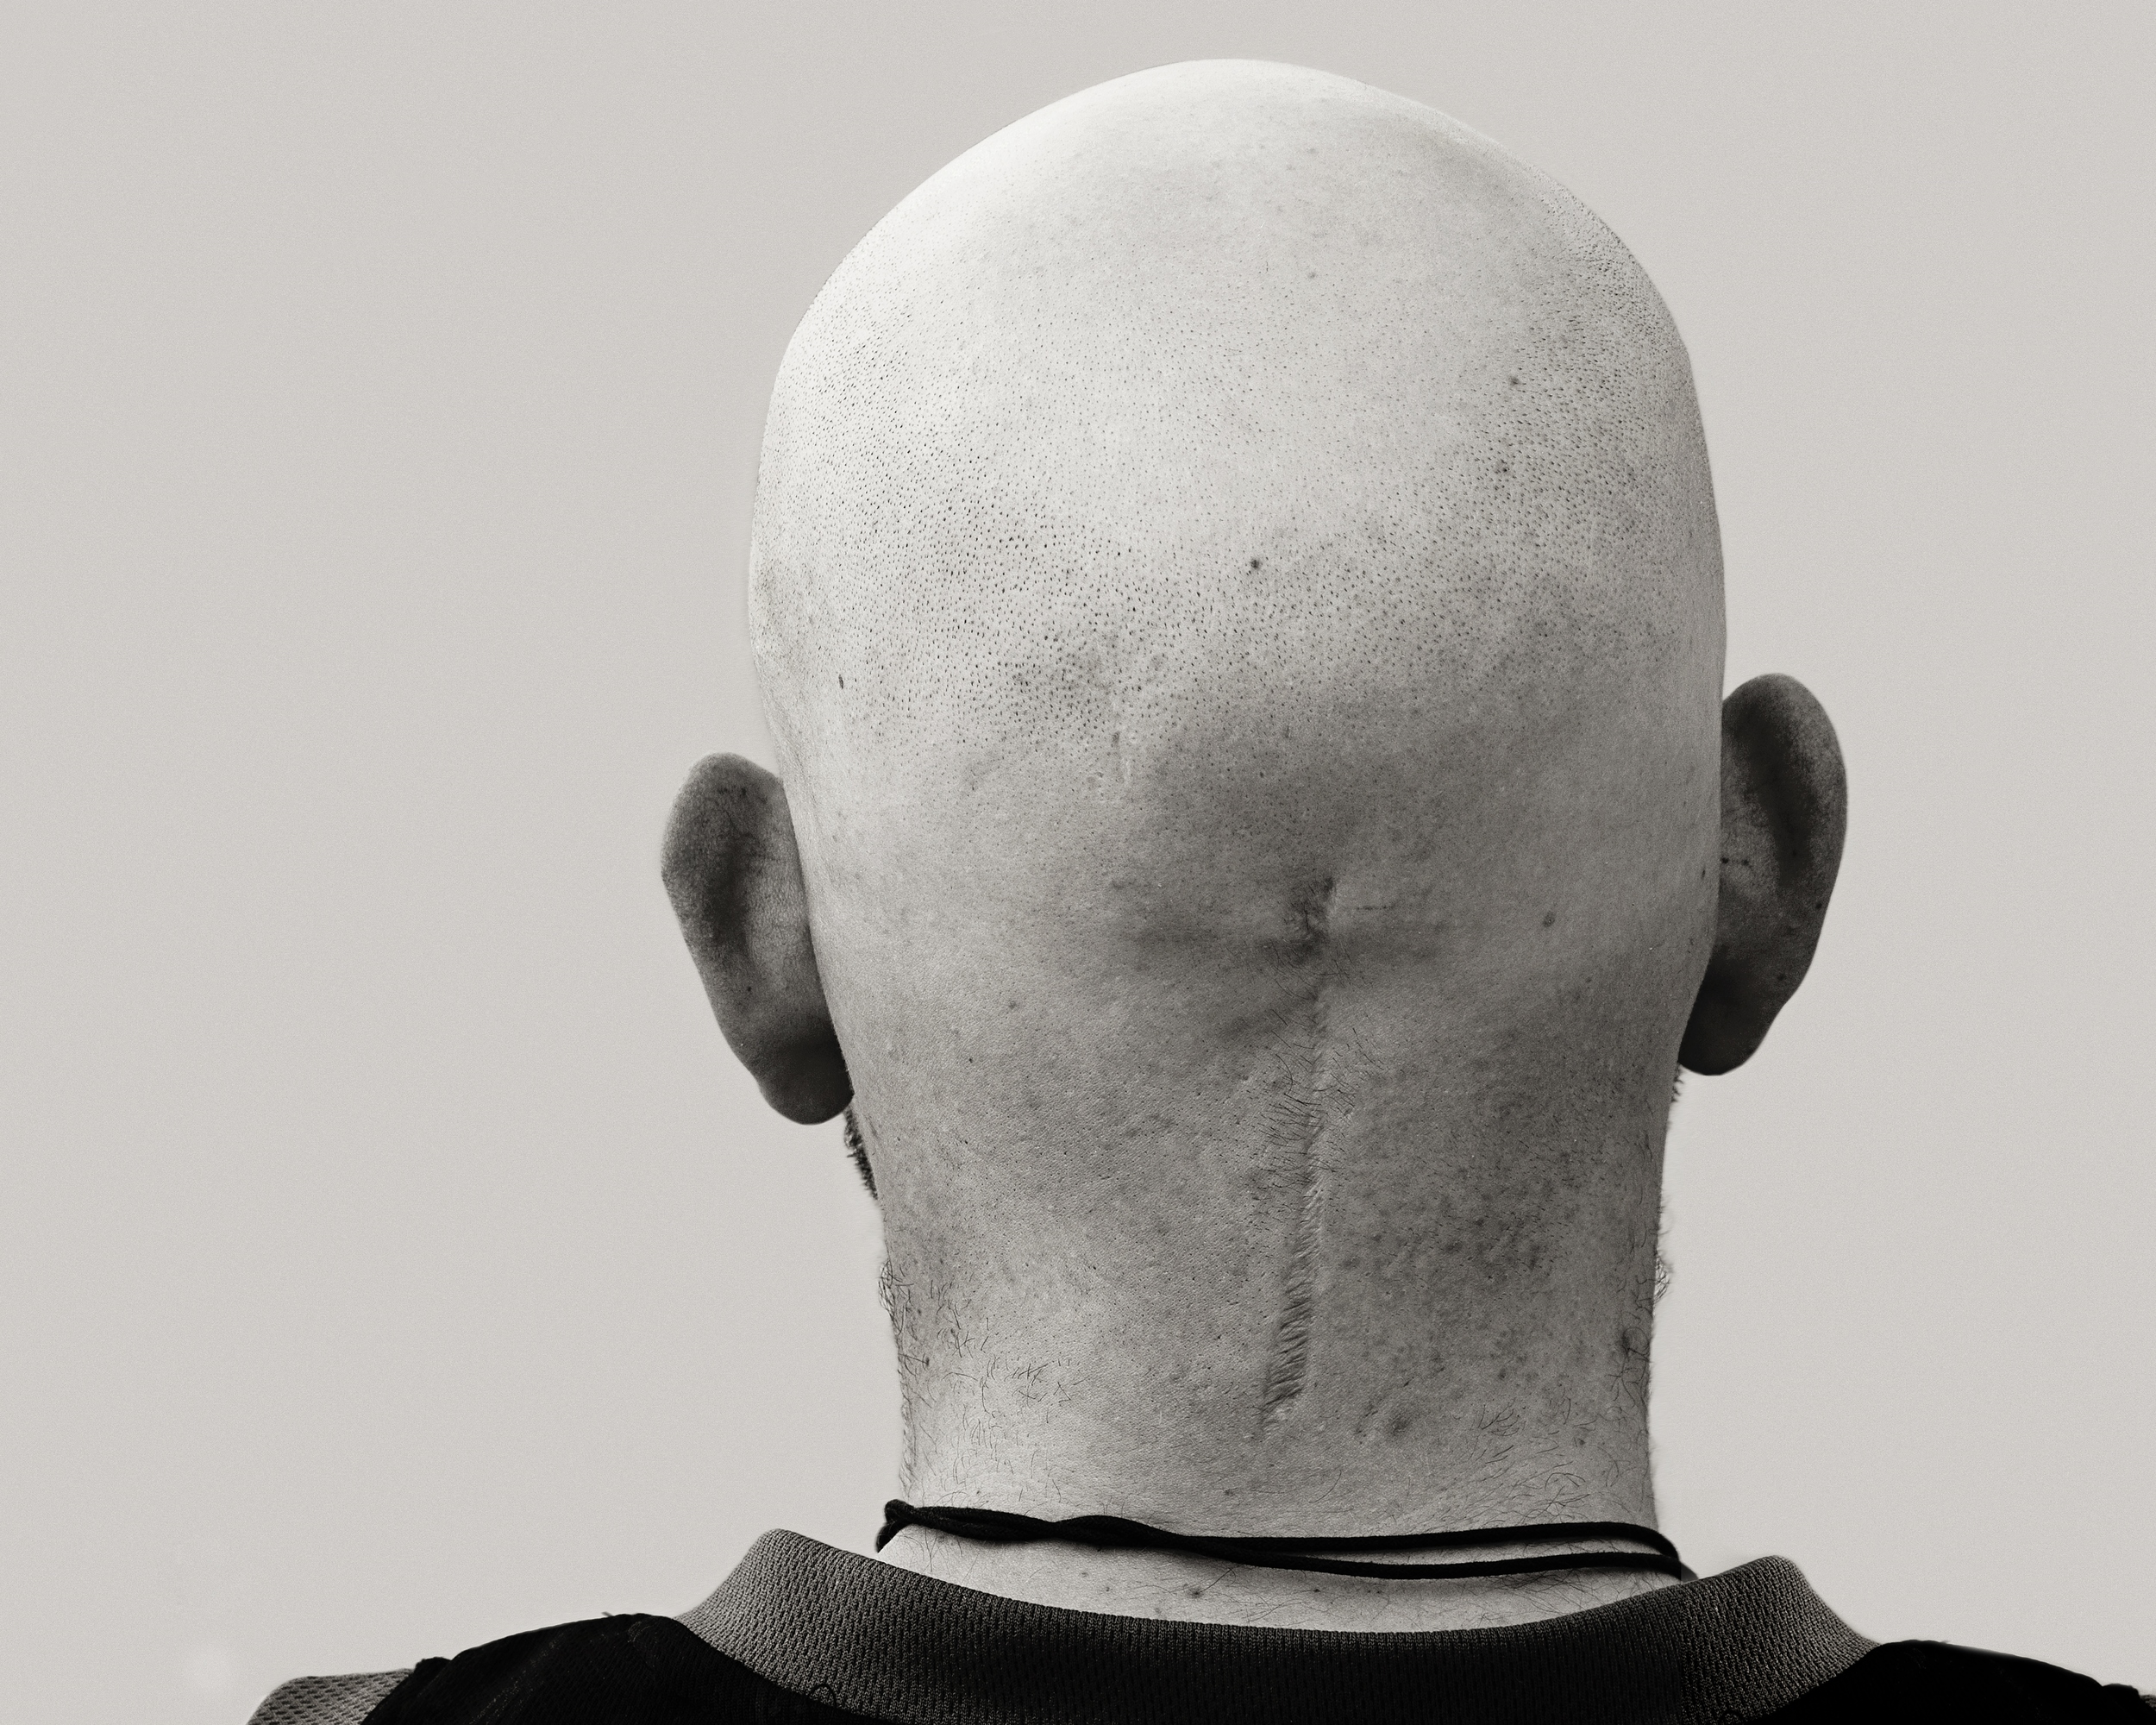 Scar Stories Craig Brain Tumour by Brihanna Rilstone.jpg